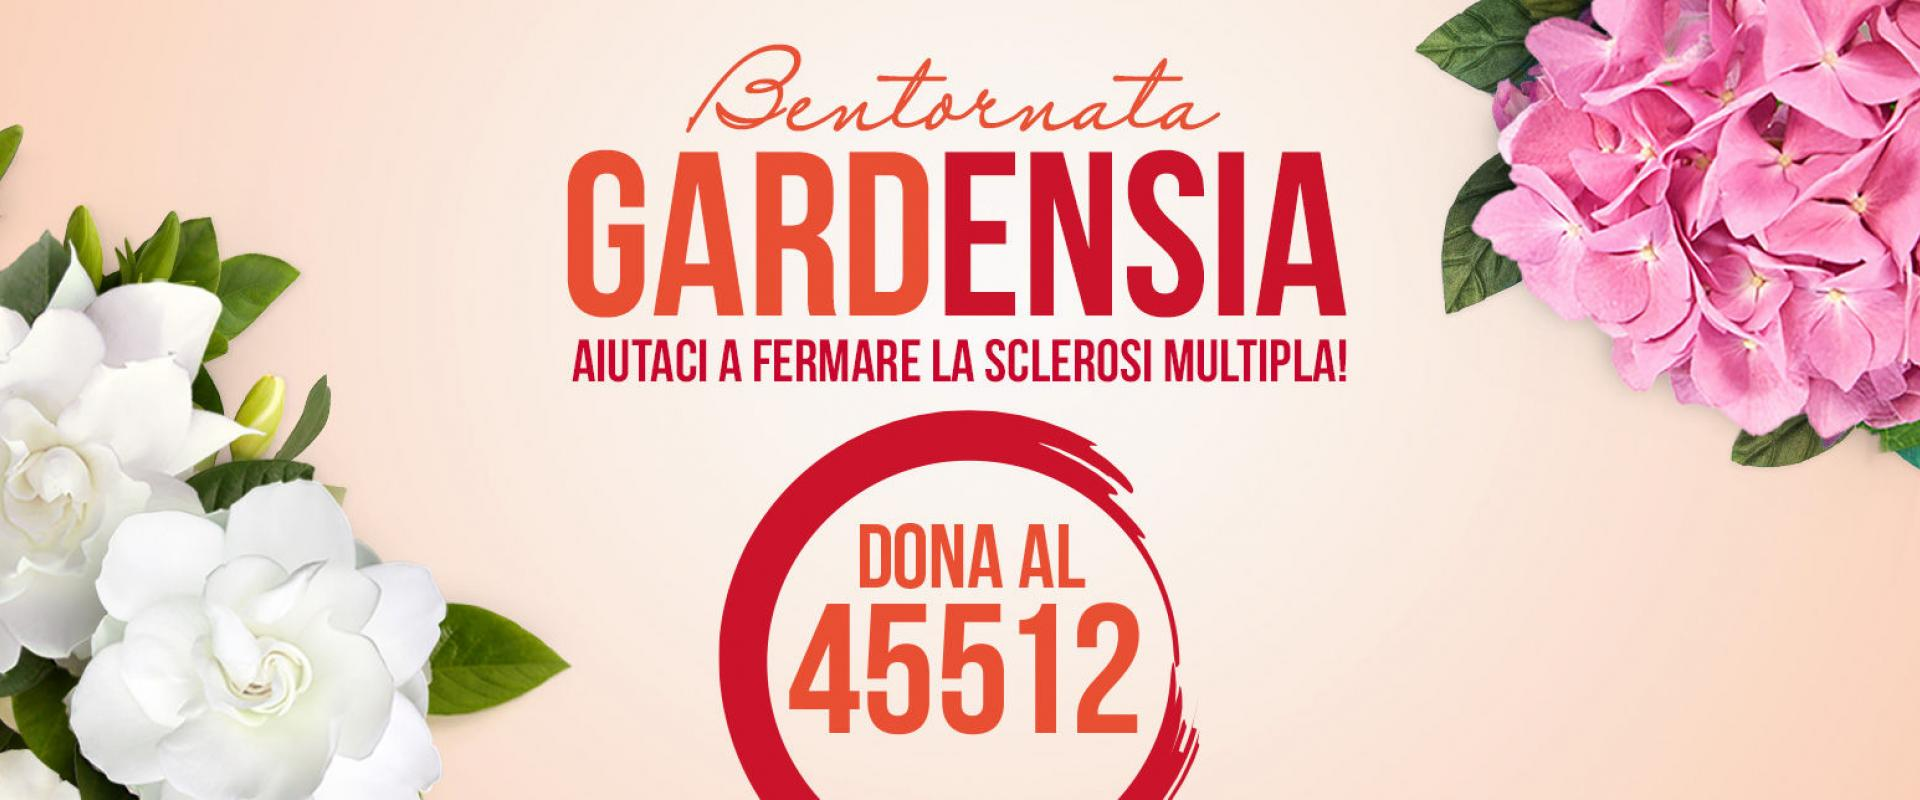 Gardensia 2020 - SMS